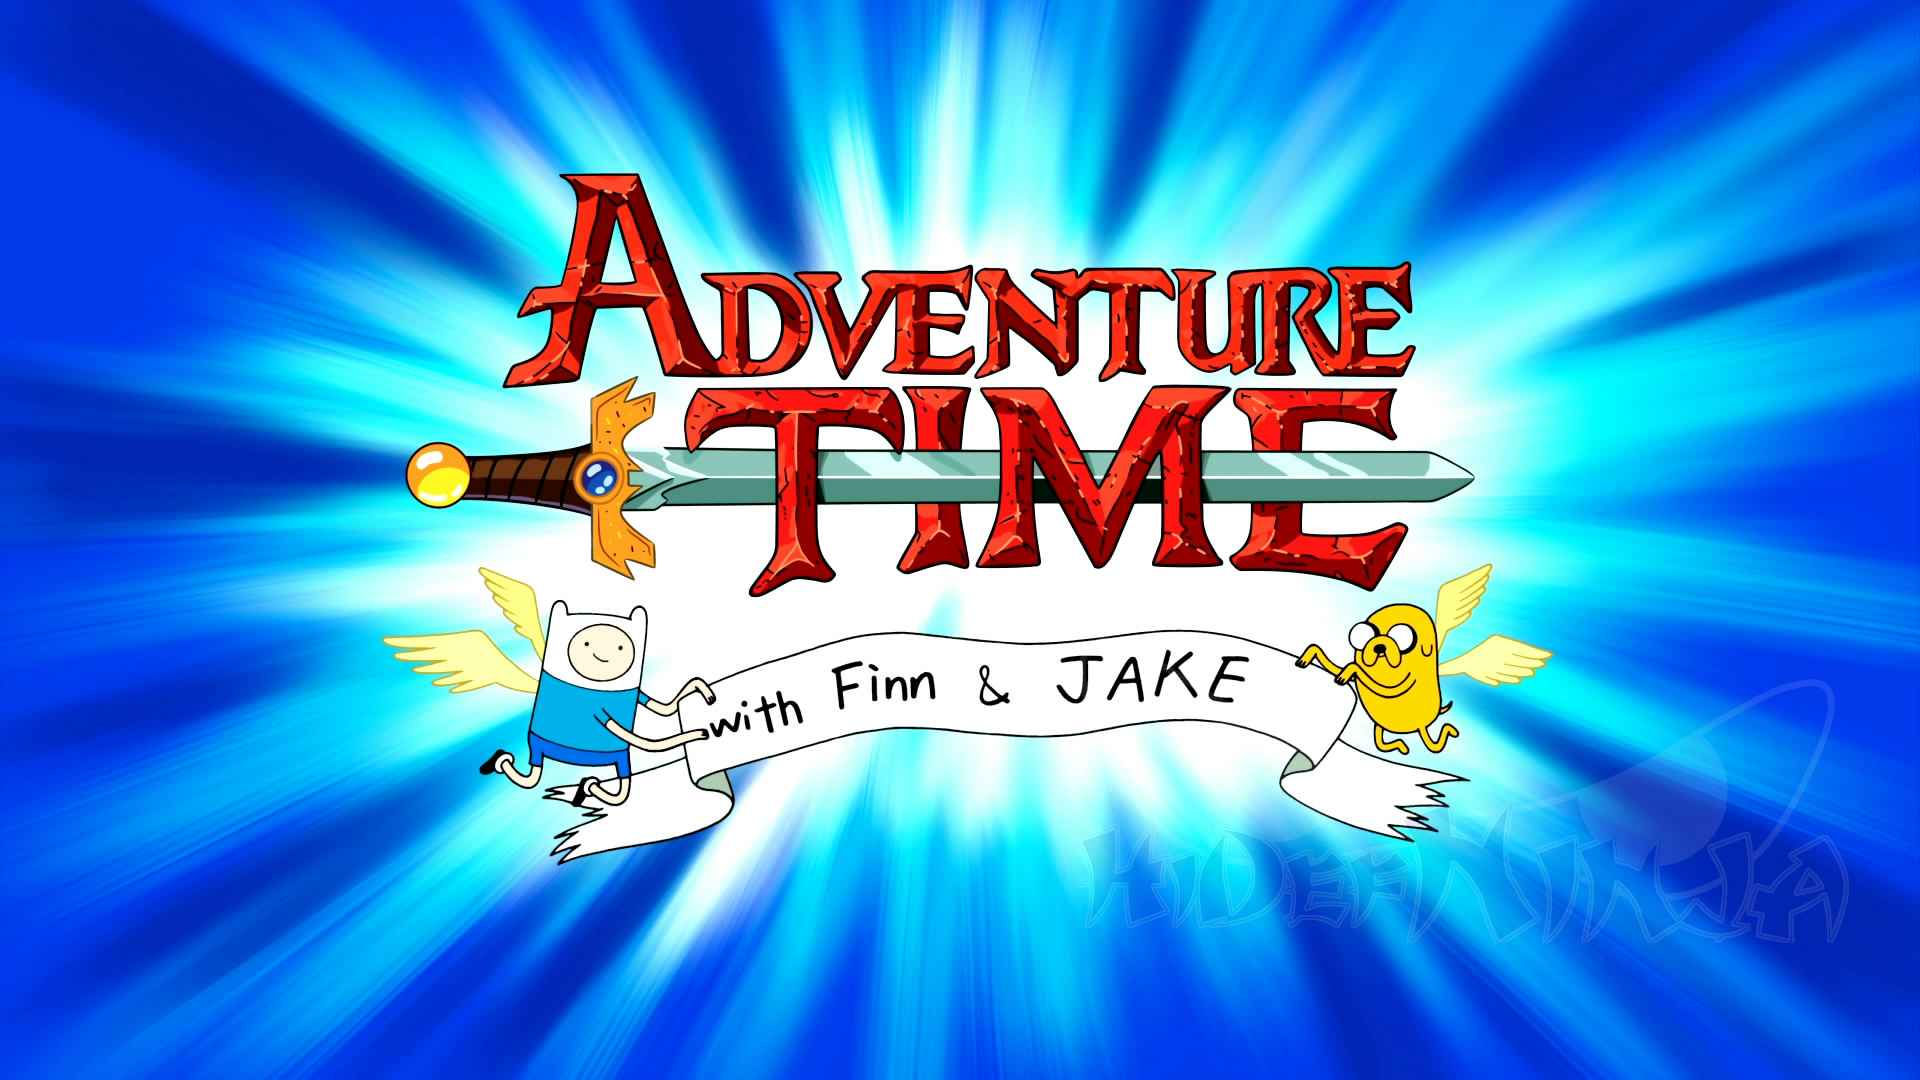 AdventureTimeS2-1